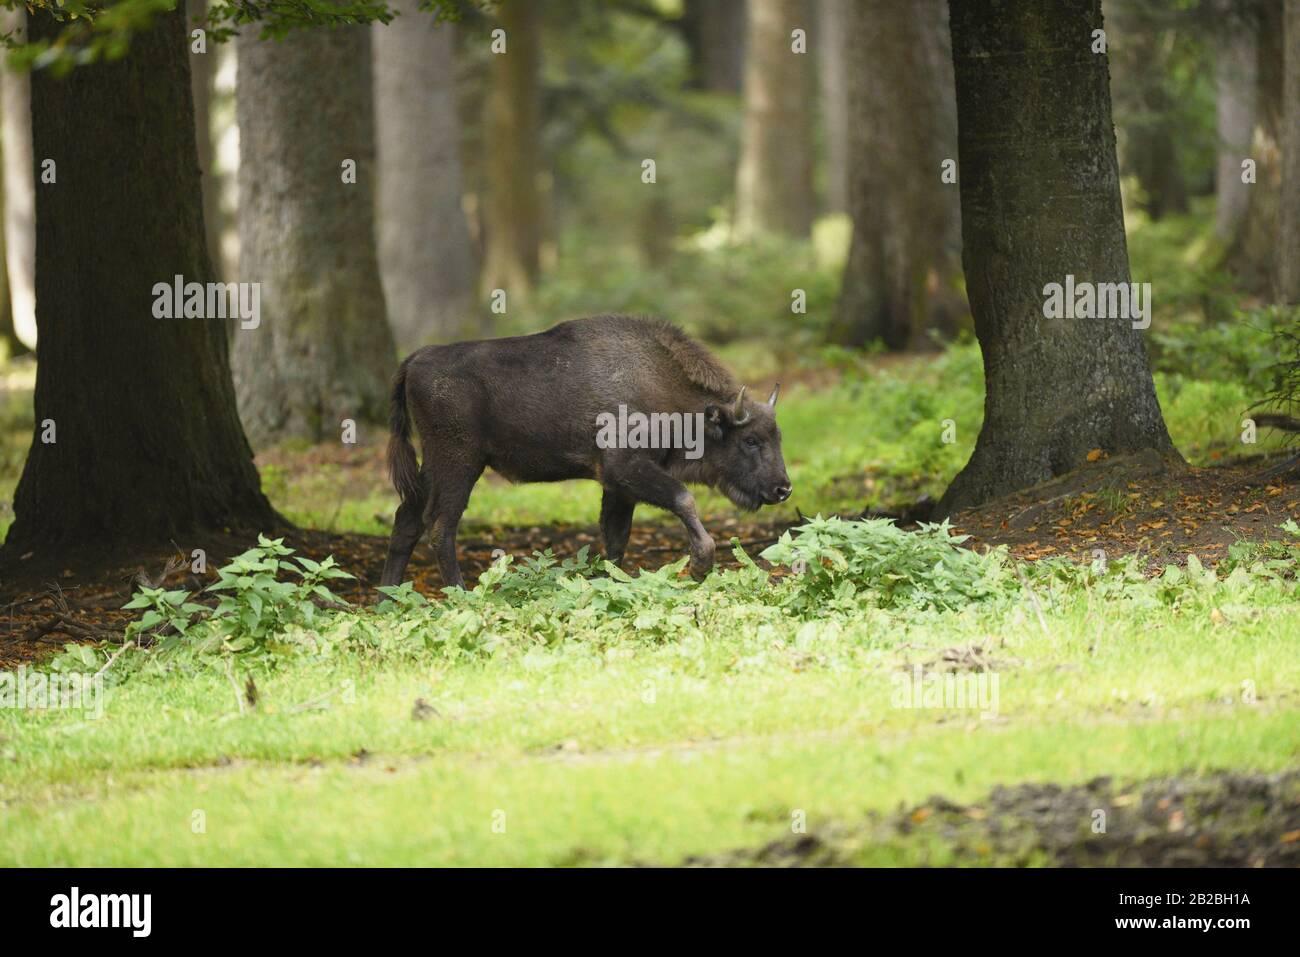 European bison (Bison bonasus) in Bavarian Forest National Park, Bavaria, Germany, Europe. Stock Photo